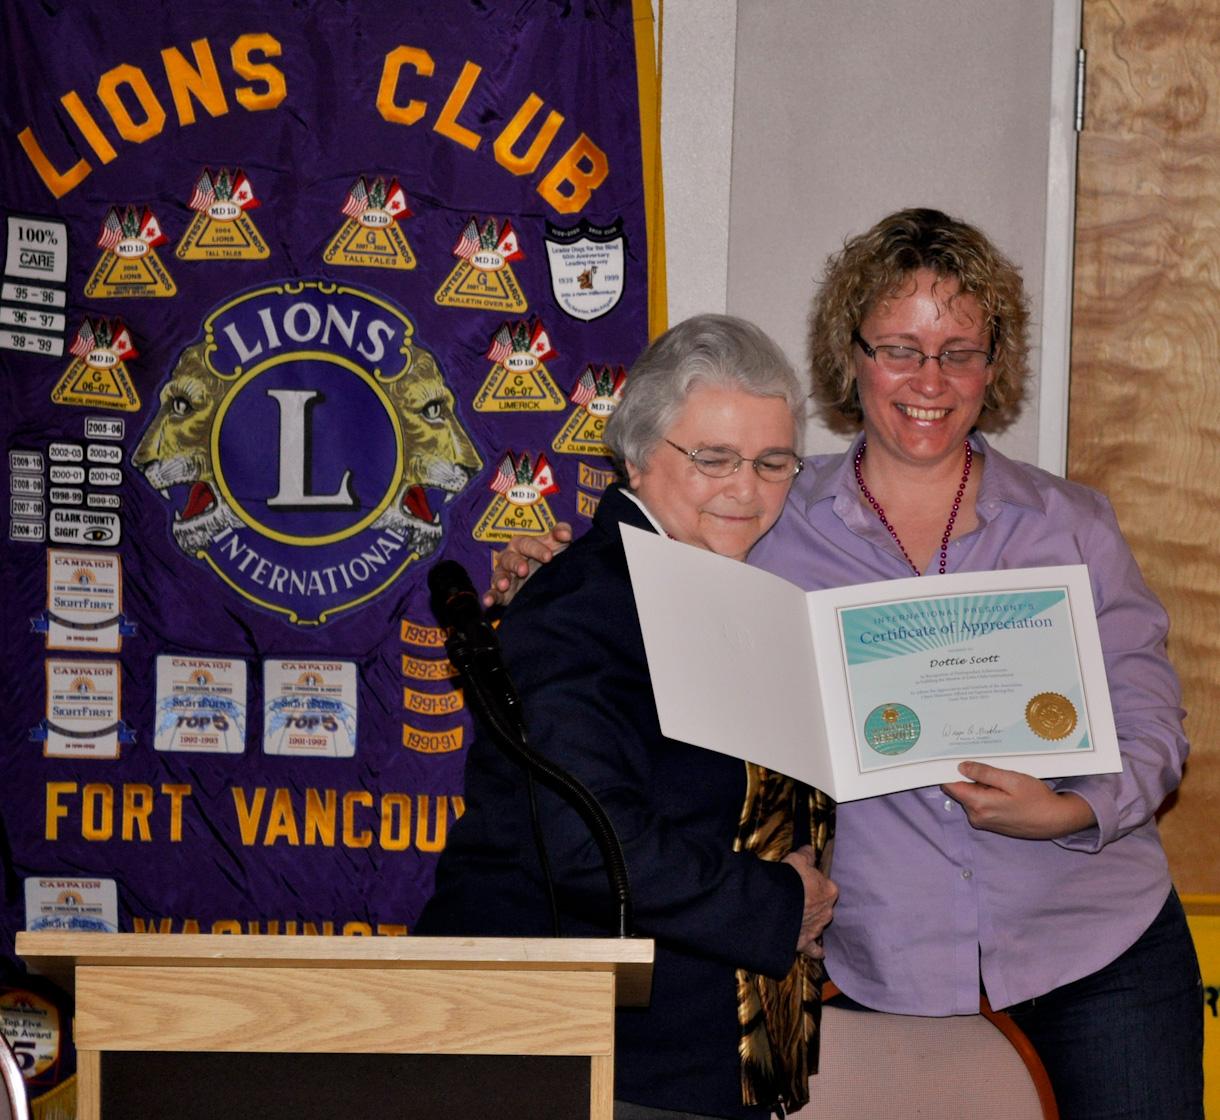 VFV 9 Fort Vancouver Lions